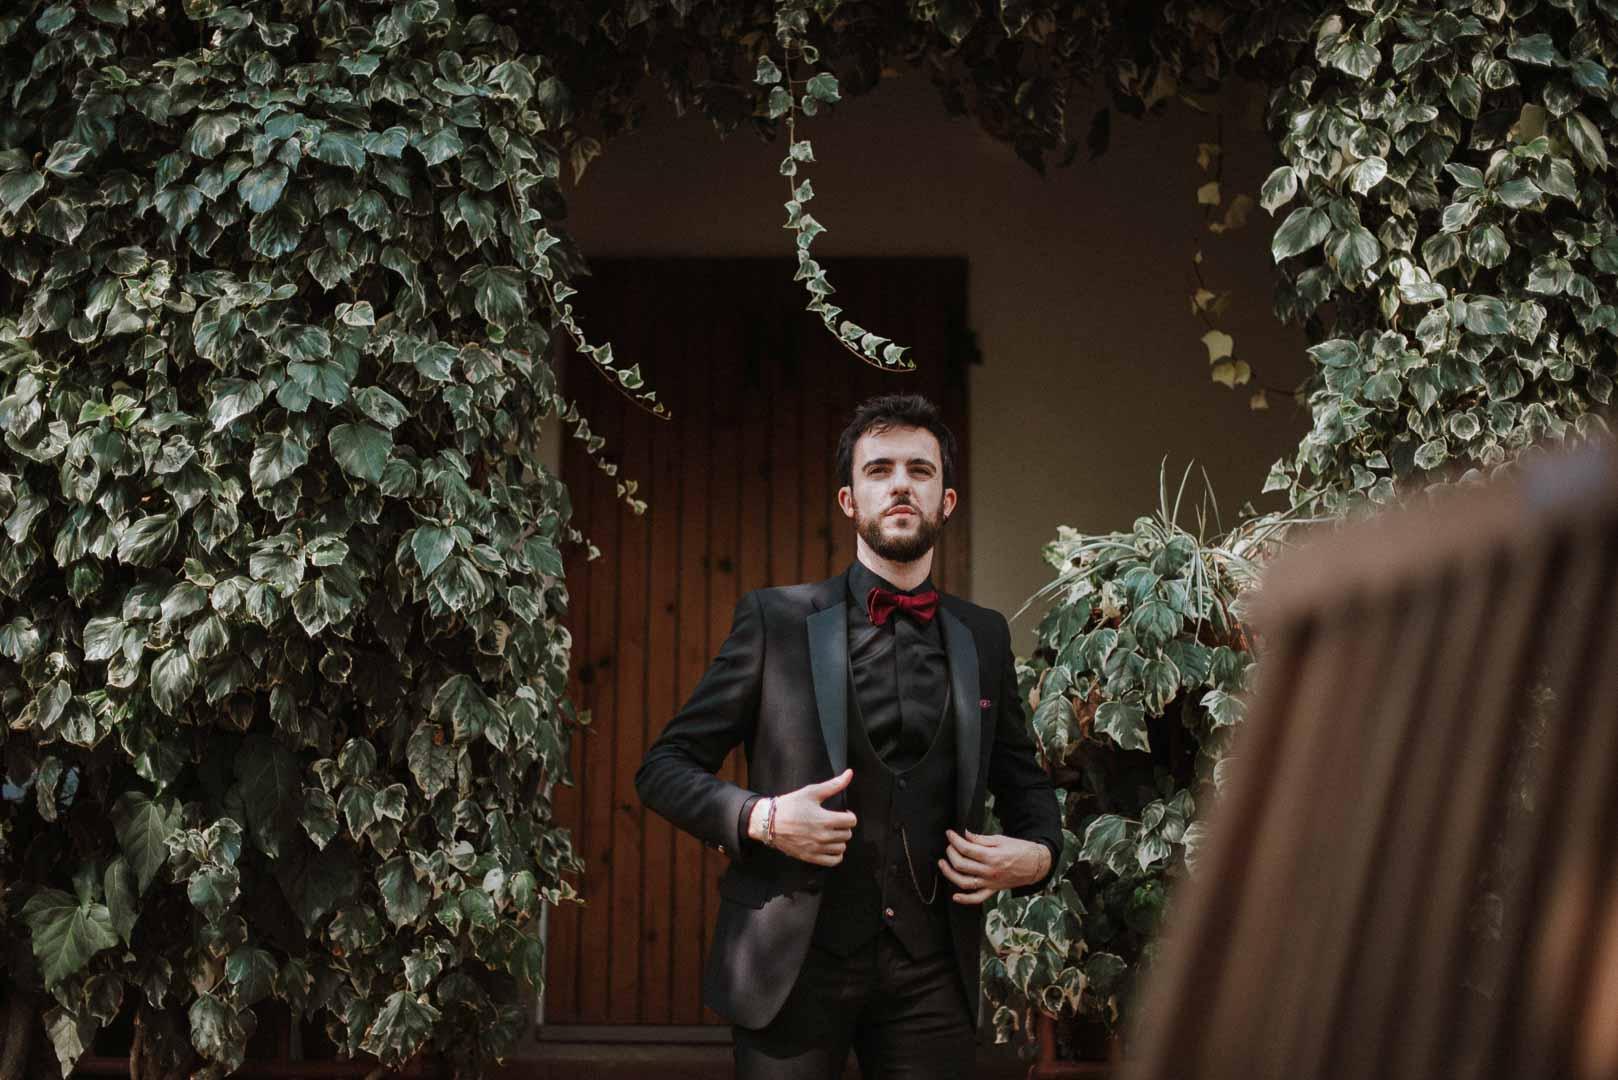 wedding-photographer-destination-fineart-bespoke-reportage-tuscany-villascorzi-vivianeizzo-spazio46-11